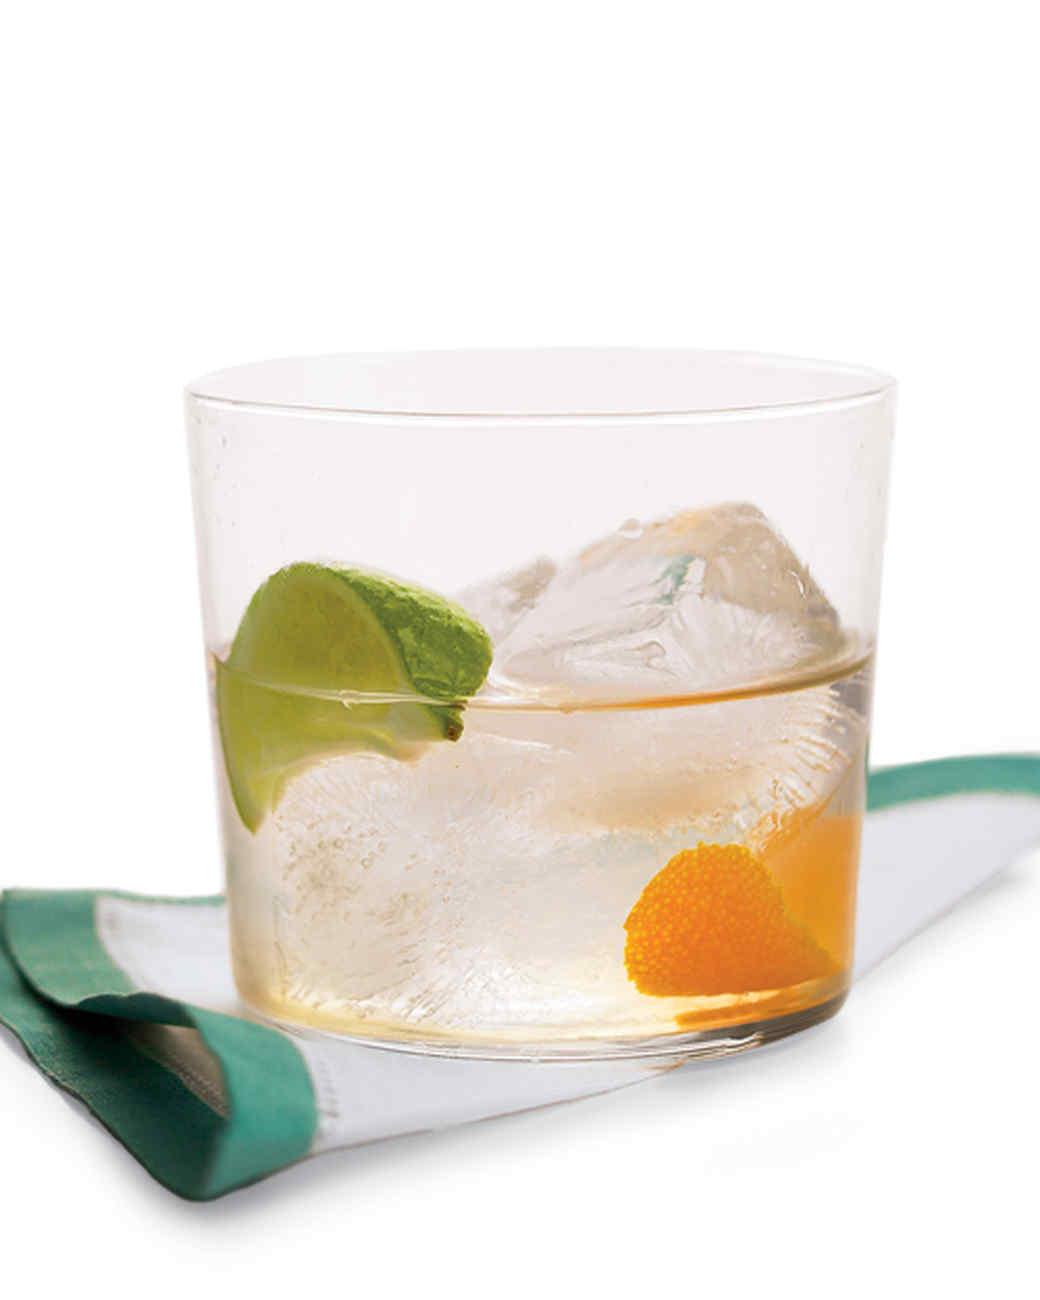 mld105524_0510_cocktail01.jpg